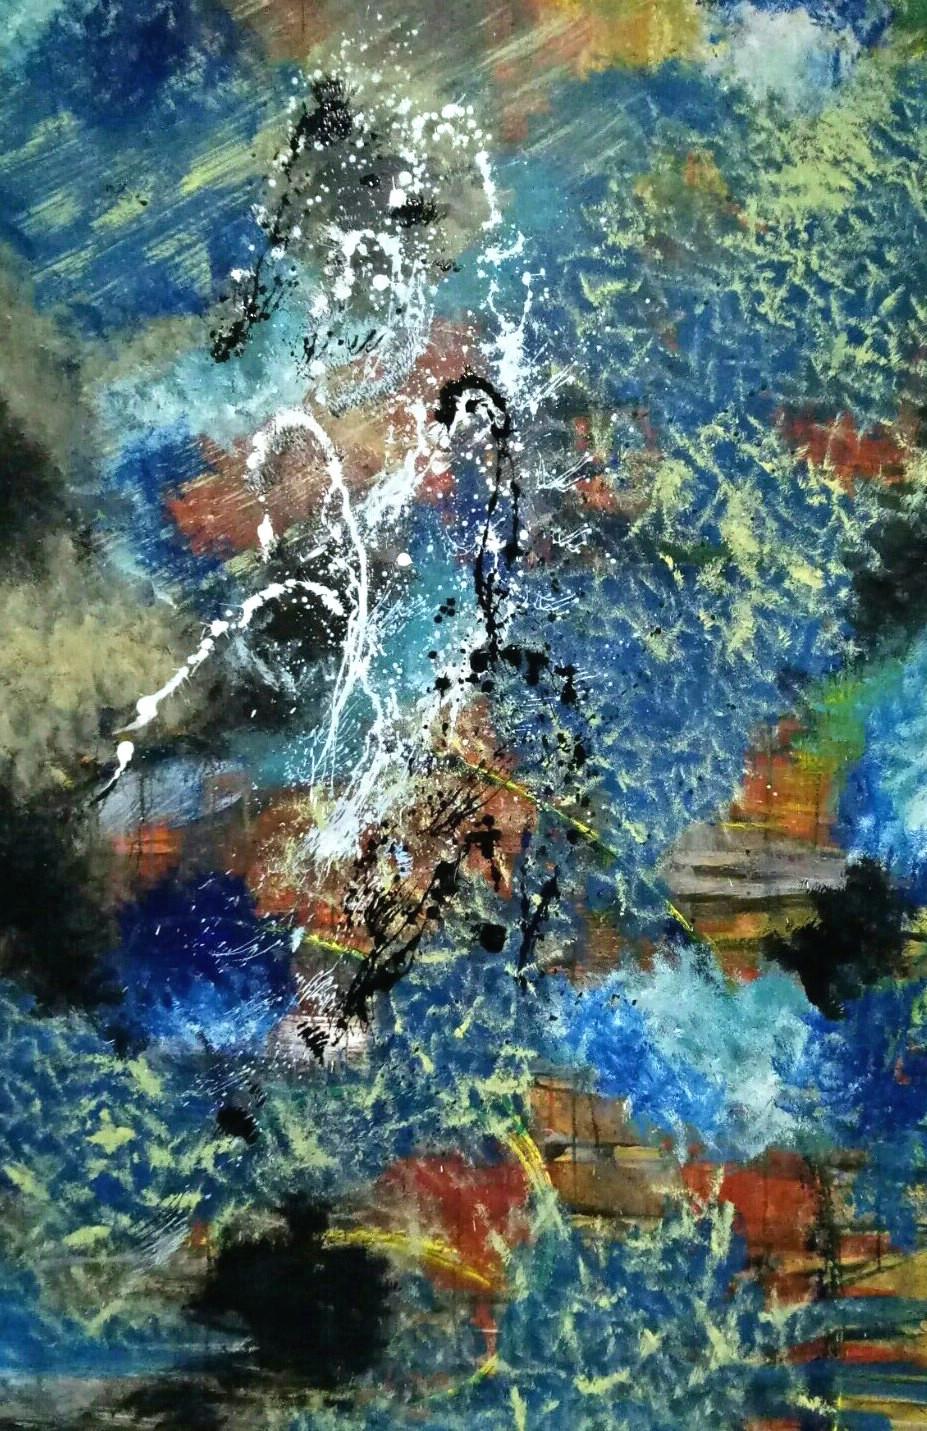 Atignas Art - Ecstasy